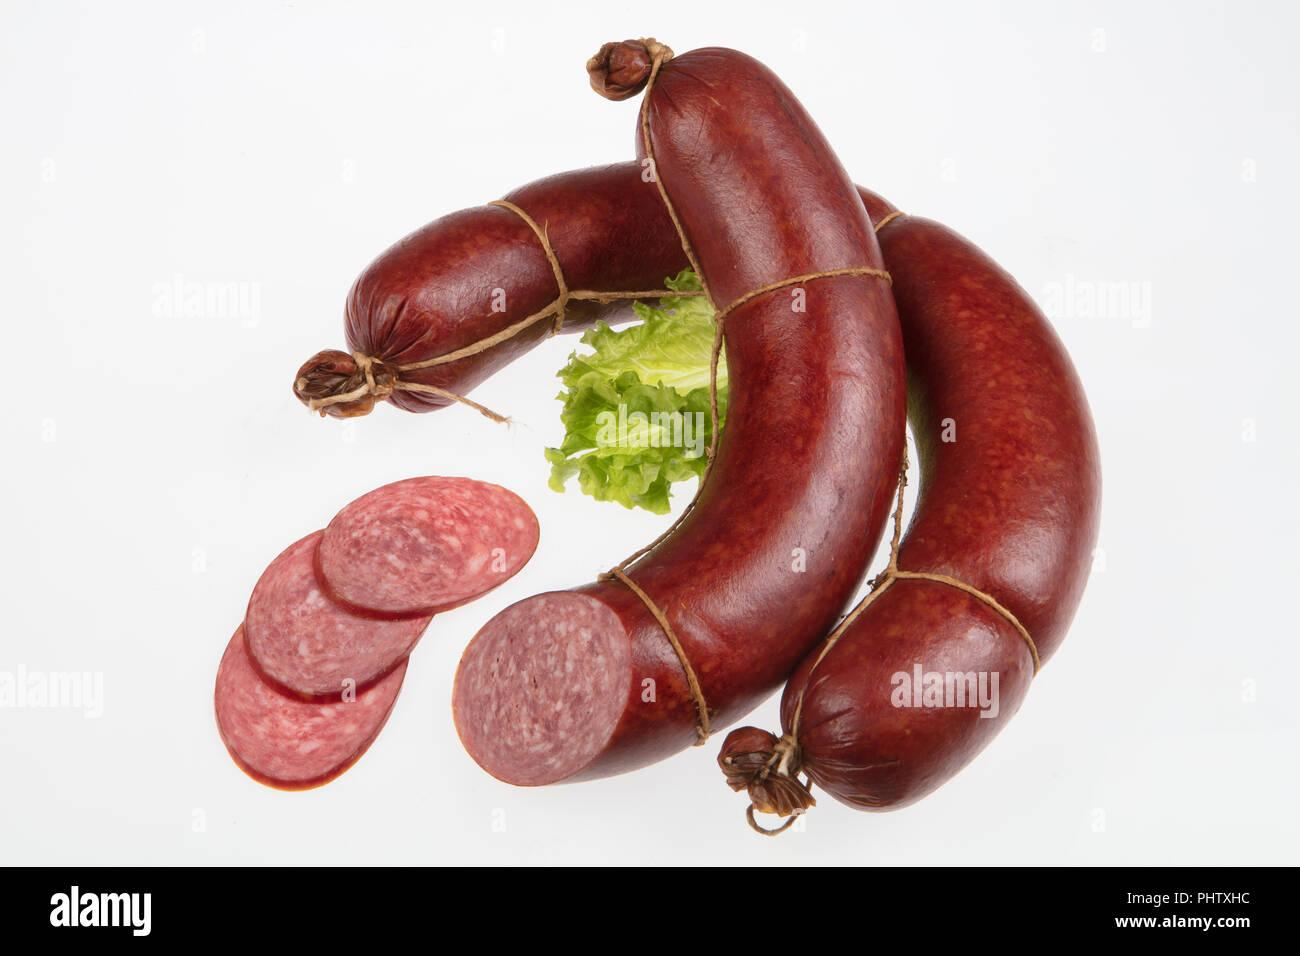 Sausage And Greenery - Stock Image